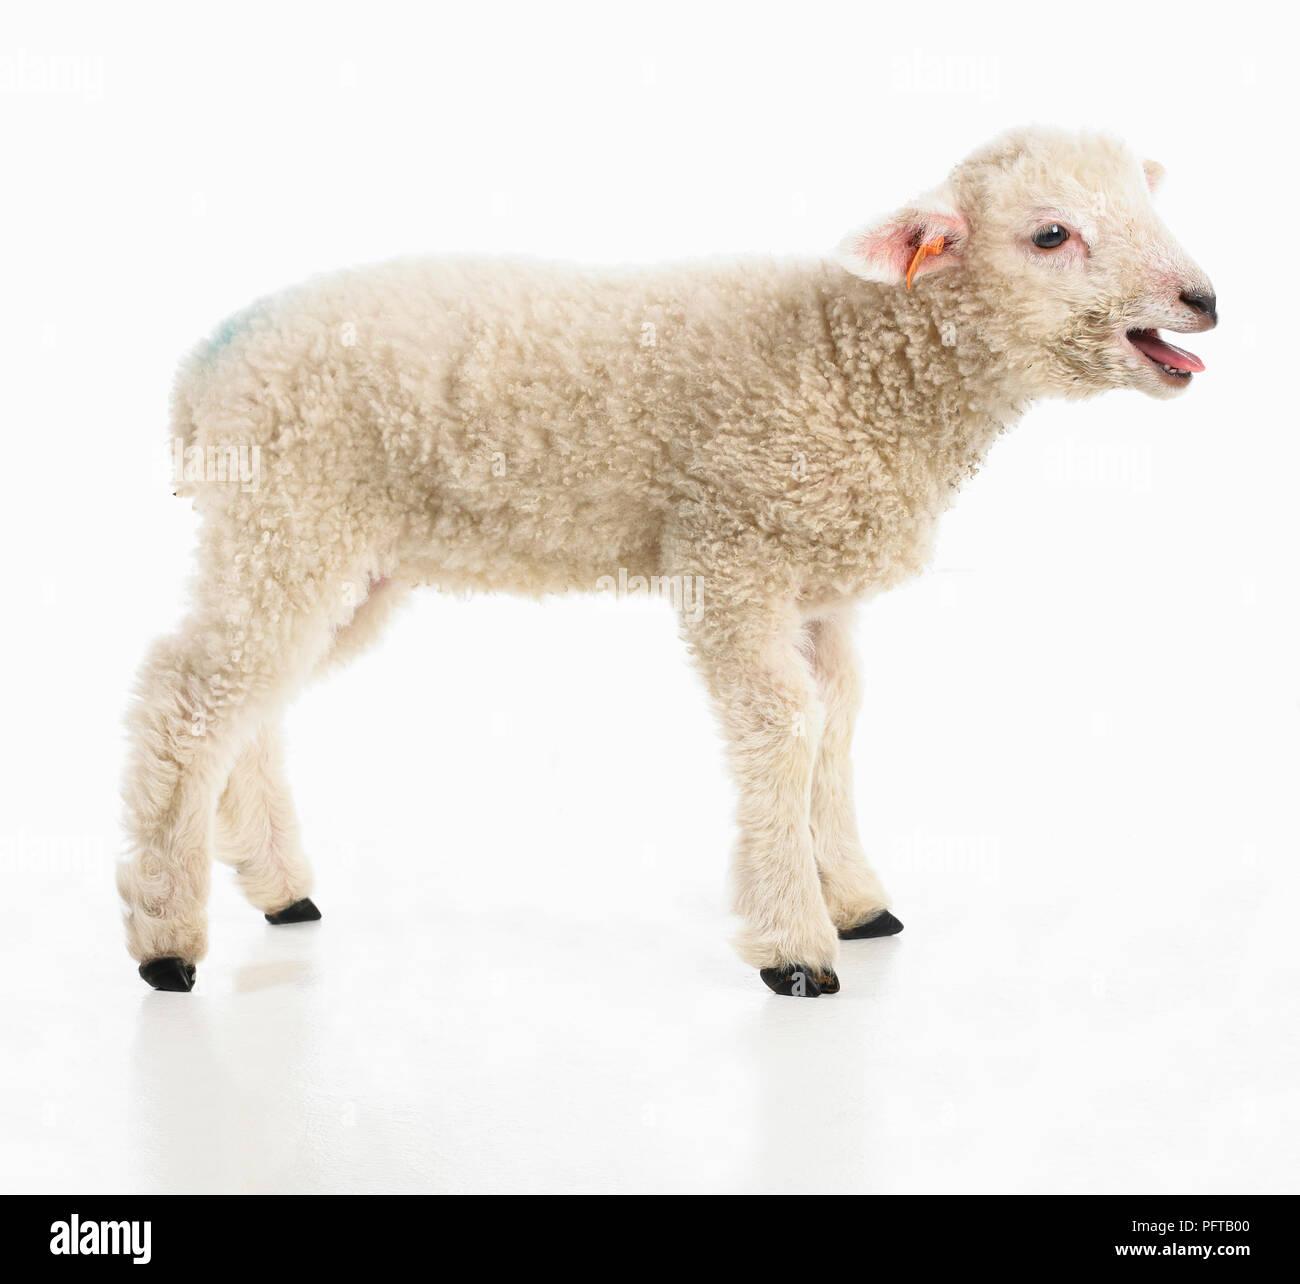 Lamb, Romney sheep, 4-week-old male - Stock Image